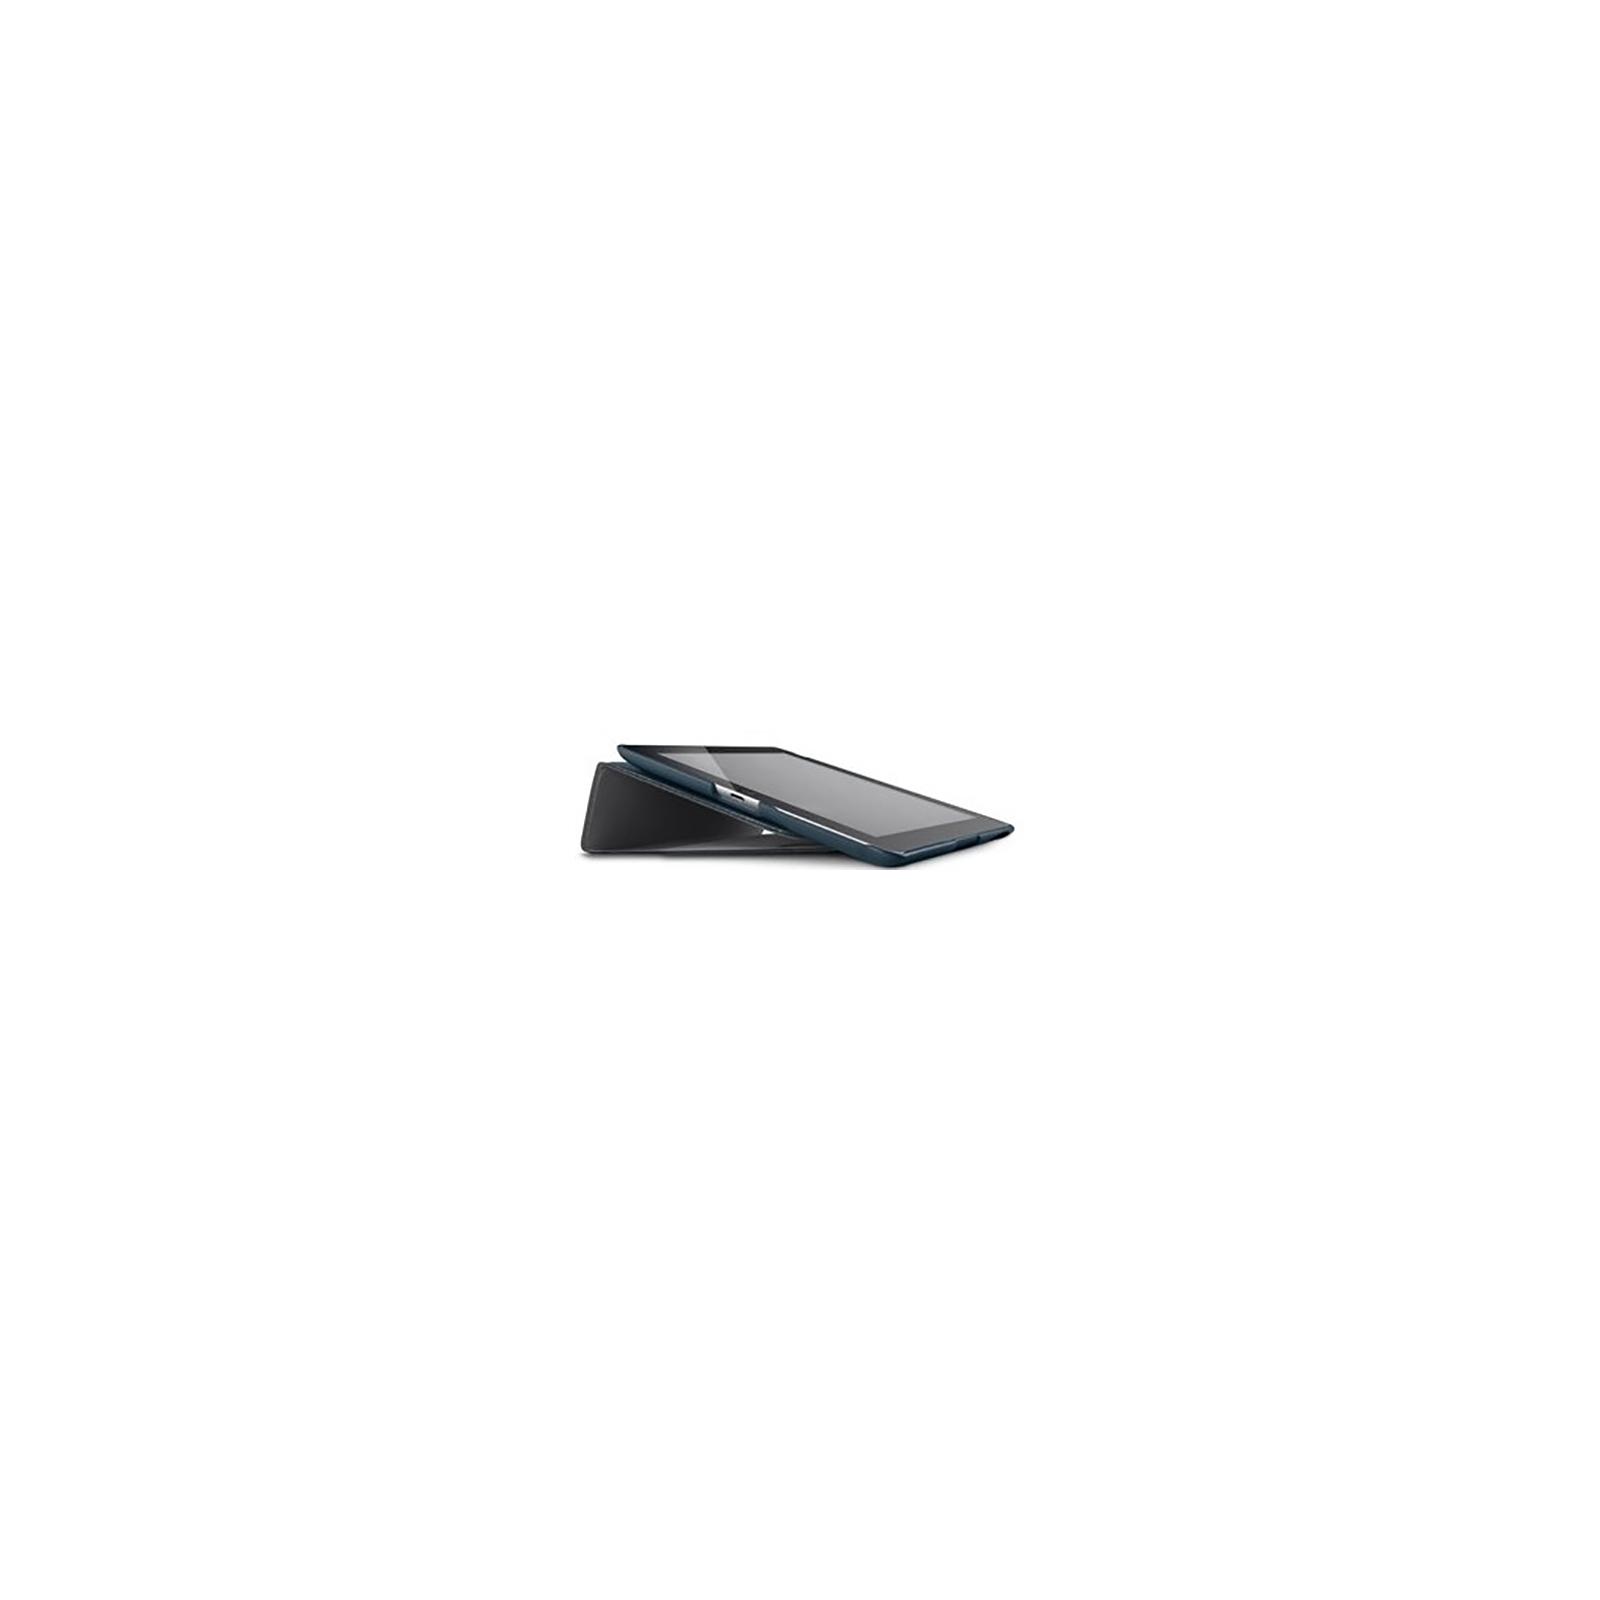 Чехол для планшета Belkin iPad Air FormFit Cover /Black (F7N063B2C00) изображение 2